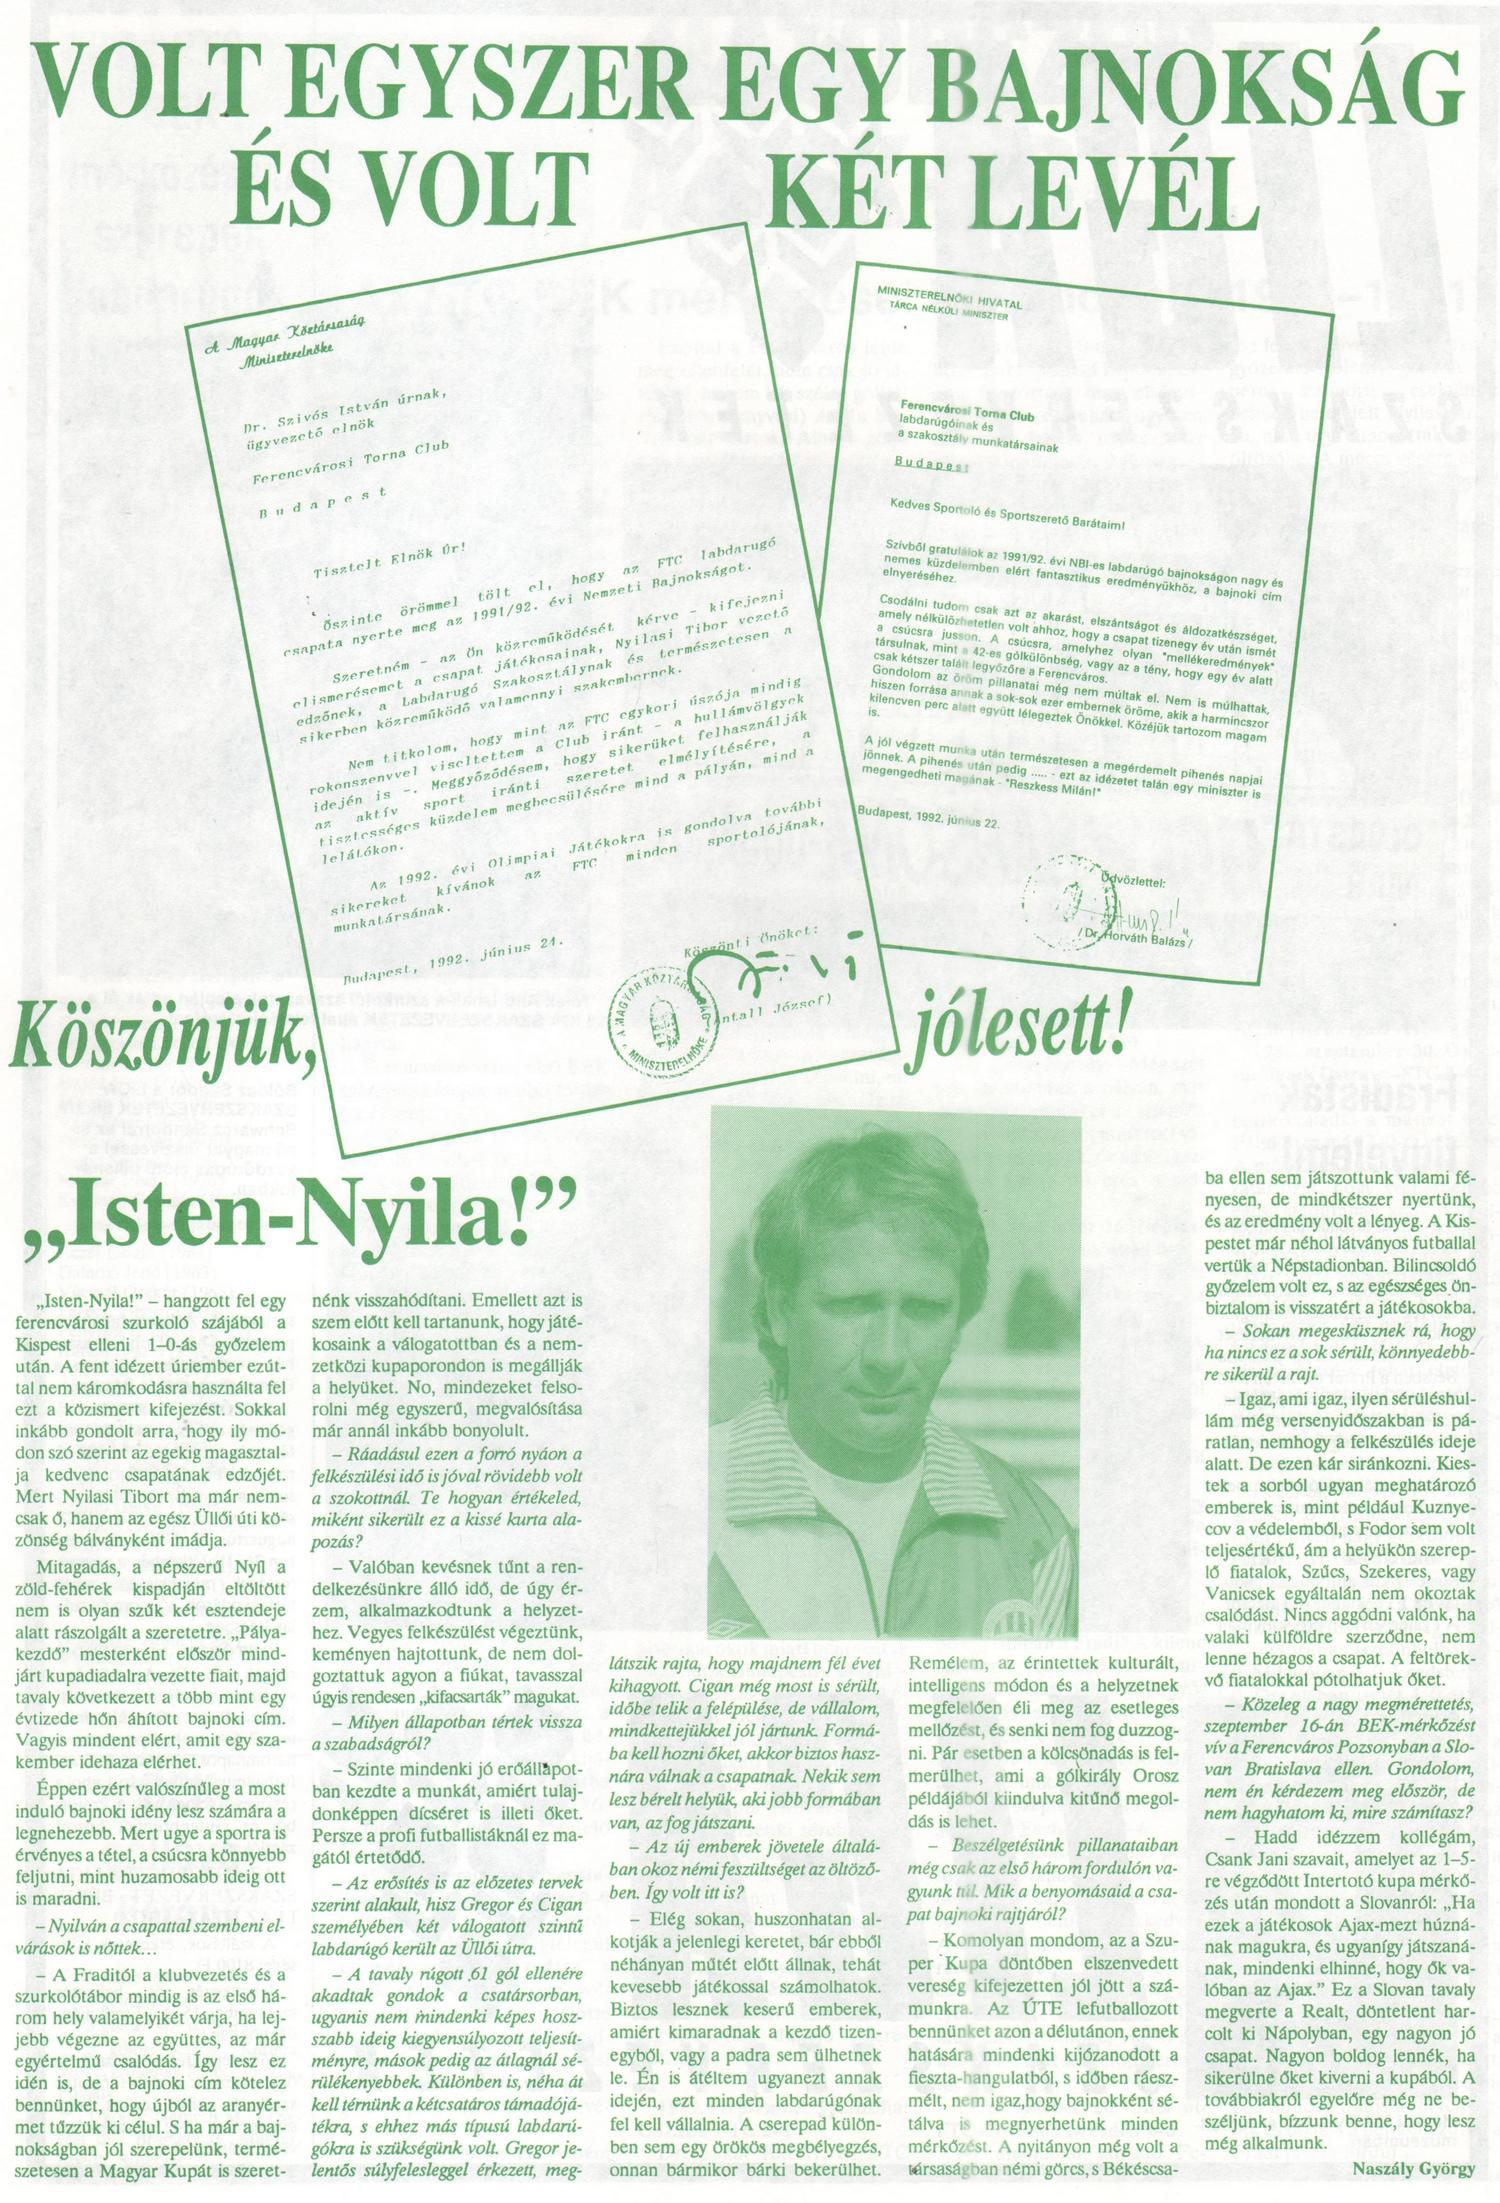 TFU_19920916_FU-Zs_BEK - 0003